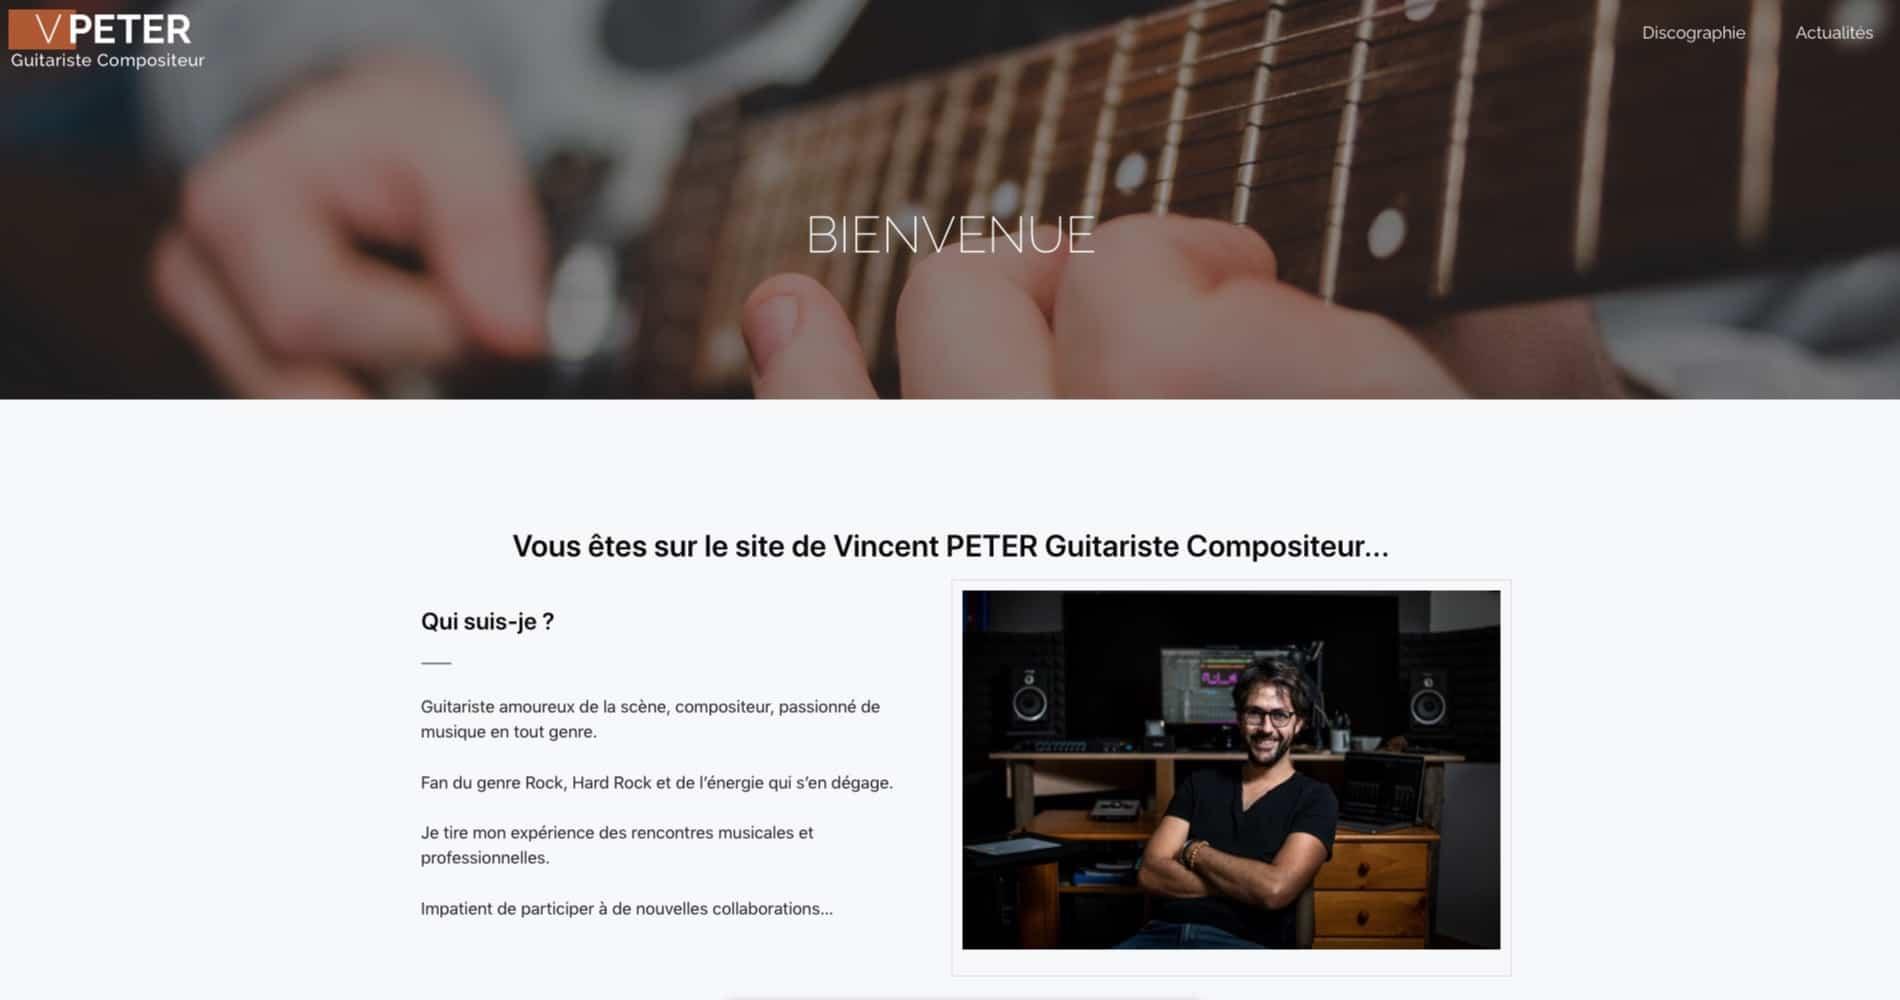 Vincent Peter